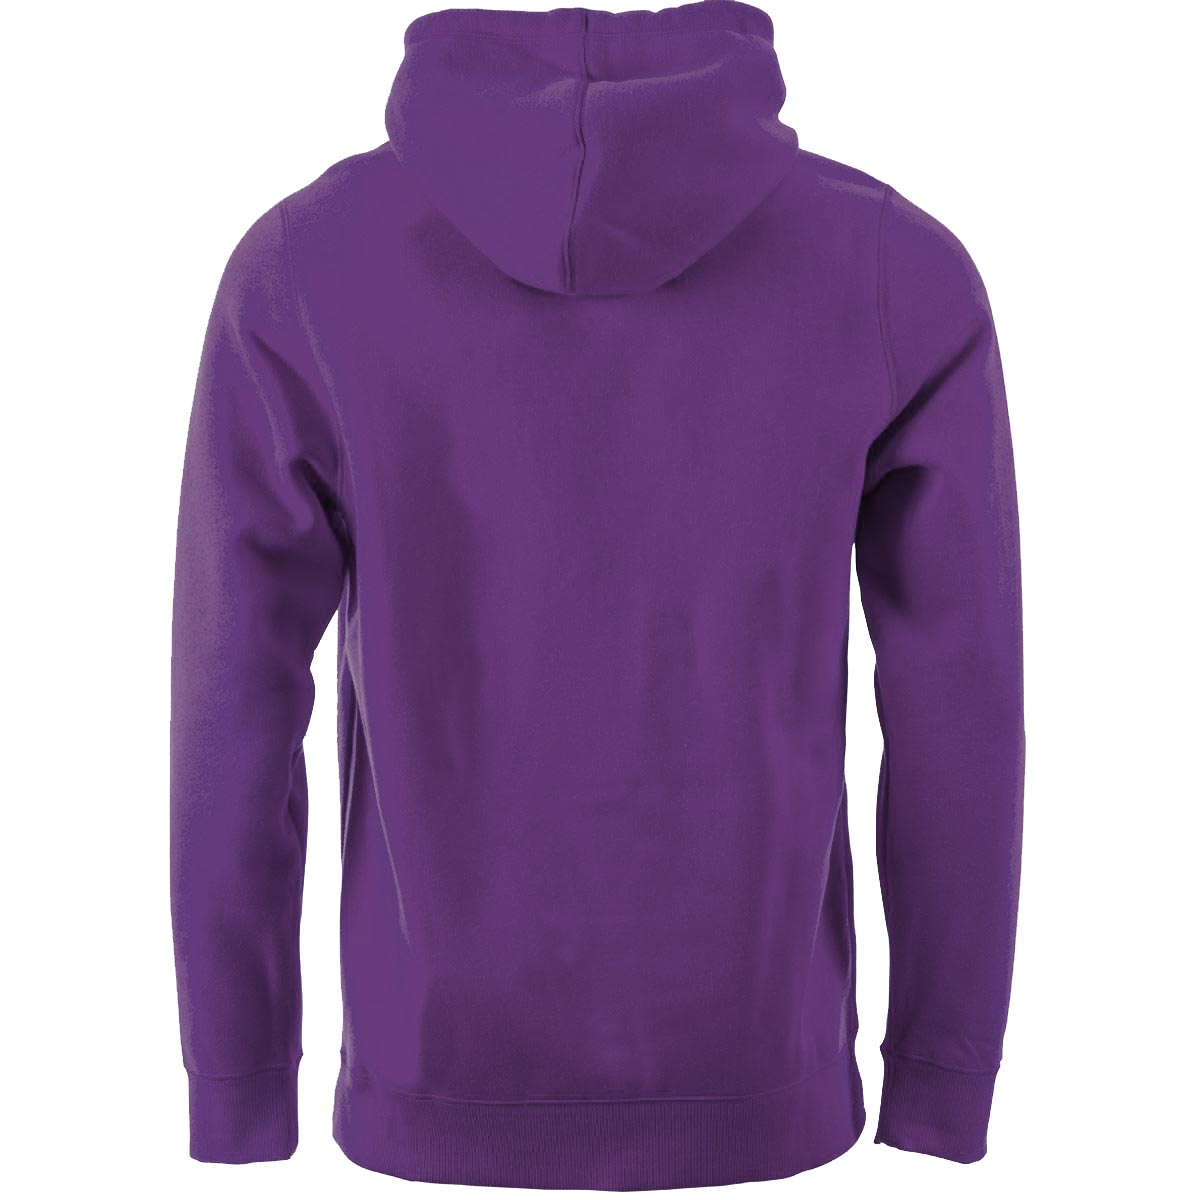 05_jh53j_violet--0-0--29976679-b51f-4298-9b17-7f837d3887d9